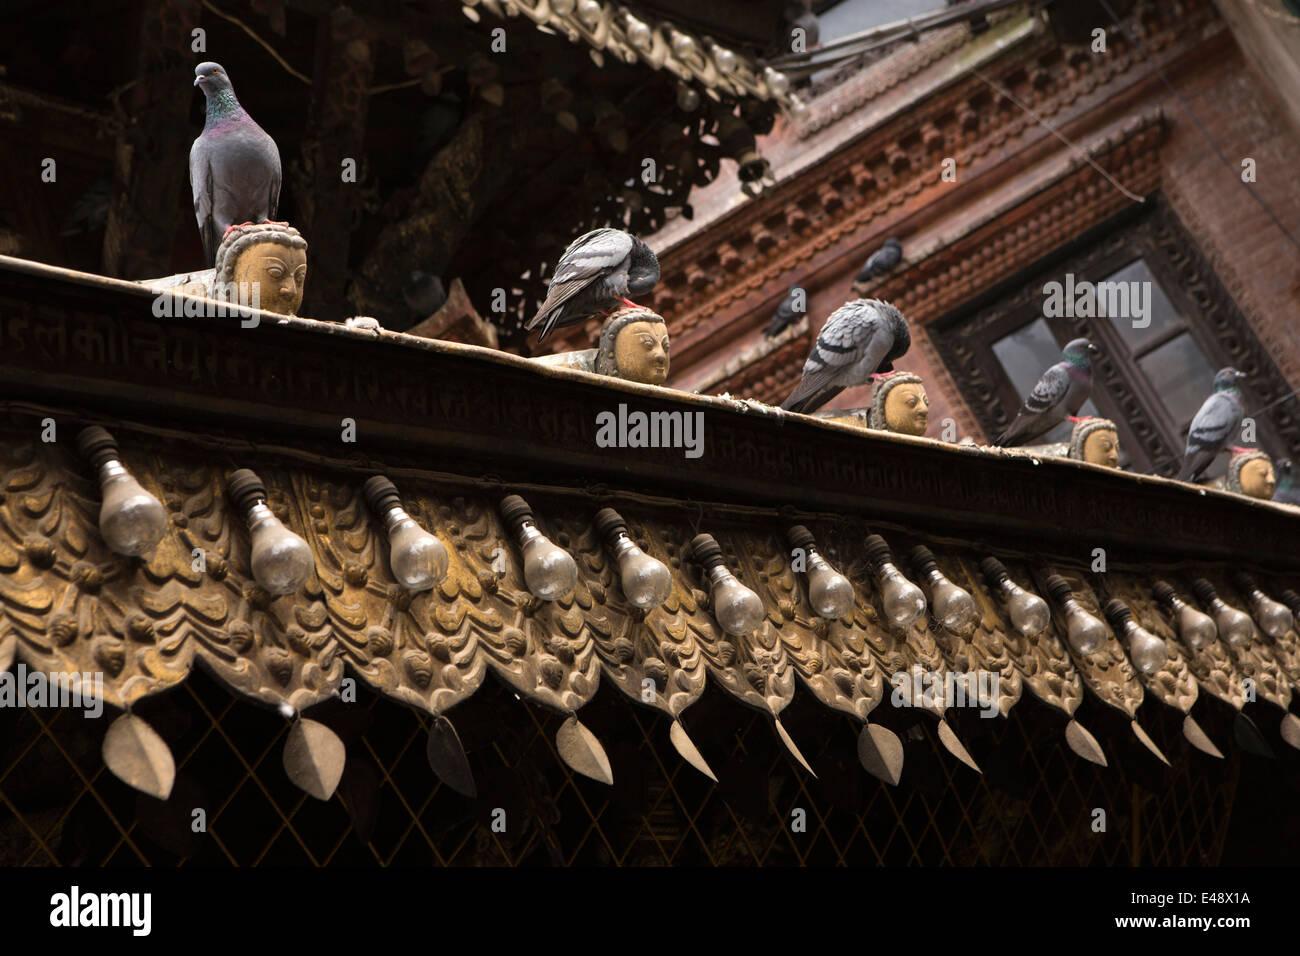 Nepal, Kathmandu, Asan Tole, Annapurna Temple, pigeons perching on decorative heads - Stock Image